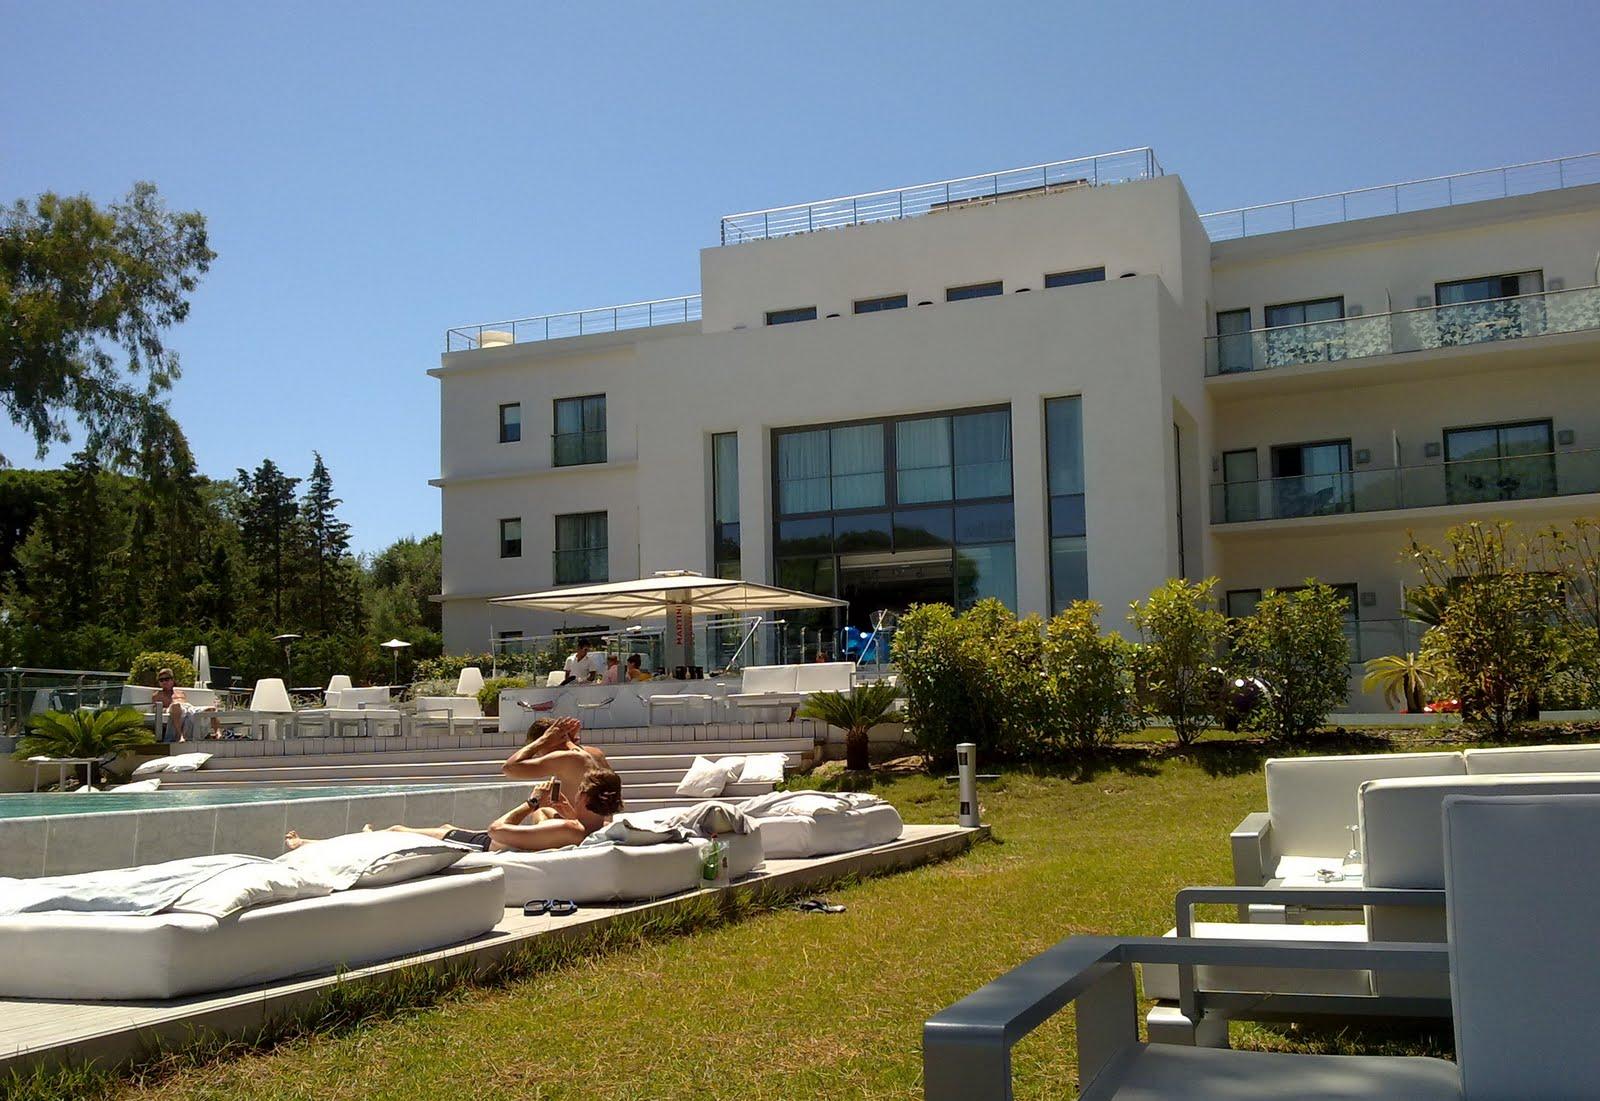 Kube Hotel Saint-Tropez - Htel toiles - Luxe Design Saint